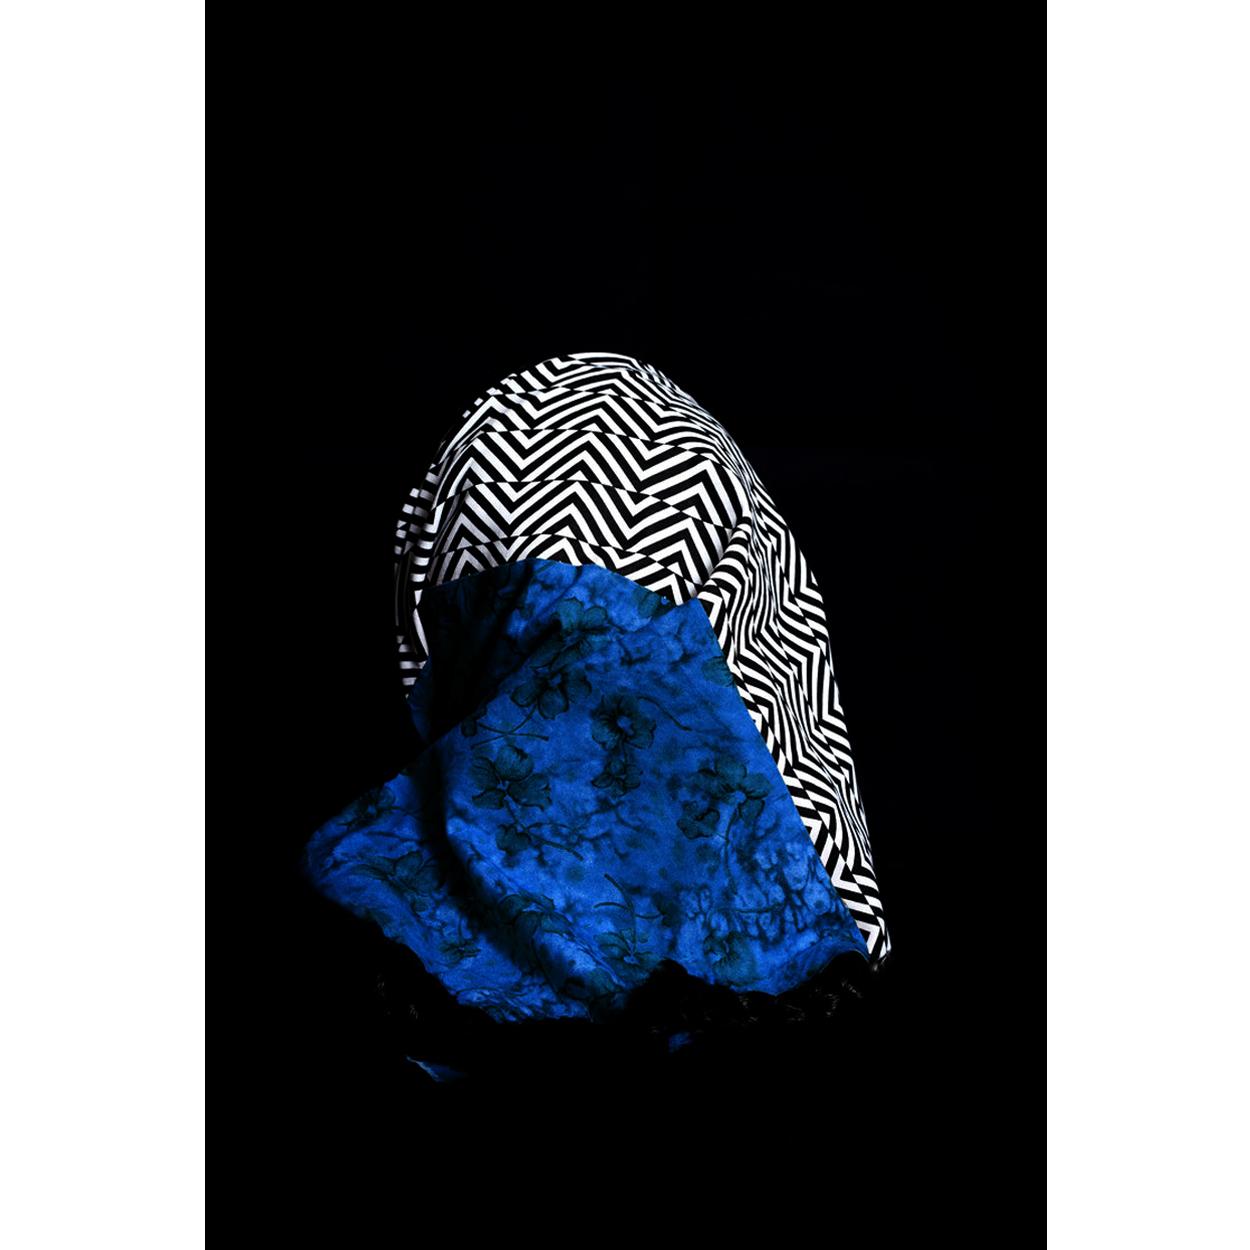 "Makhloot, 2017, Archival pigment print, 27"" x 36""."